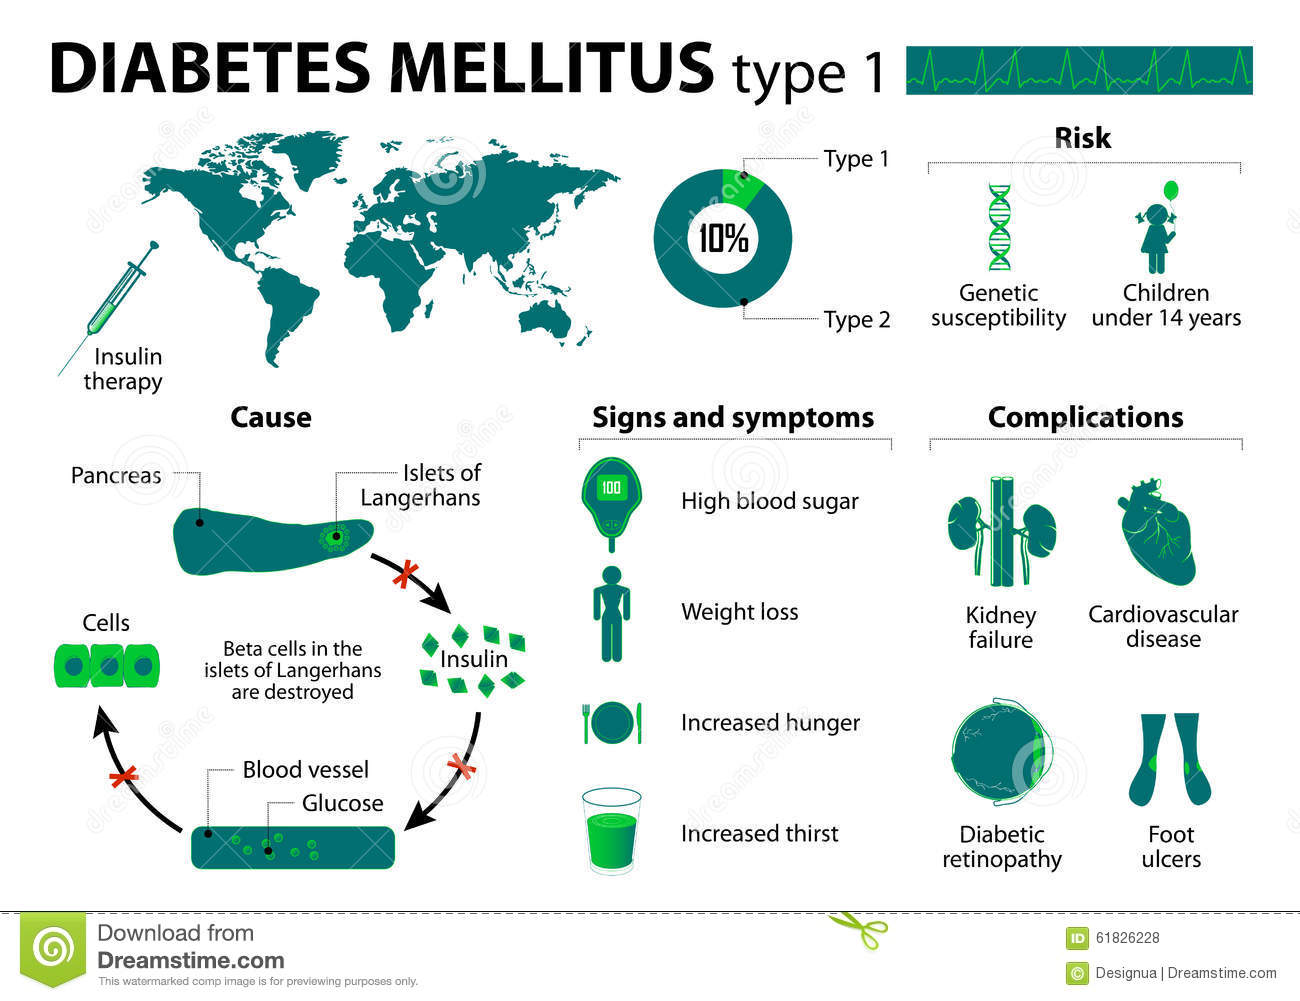 تعريف مرض السكري وانواعه